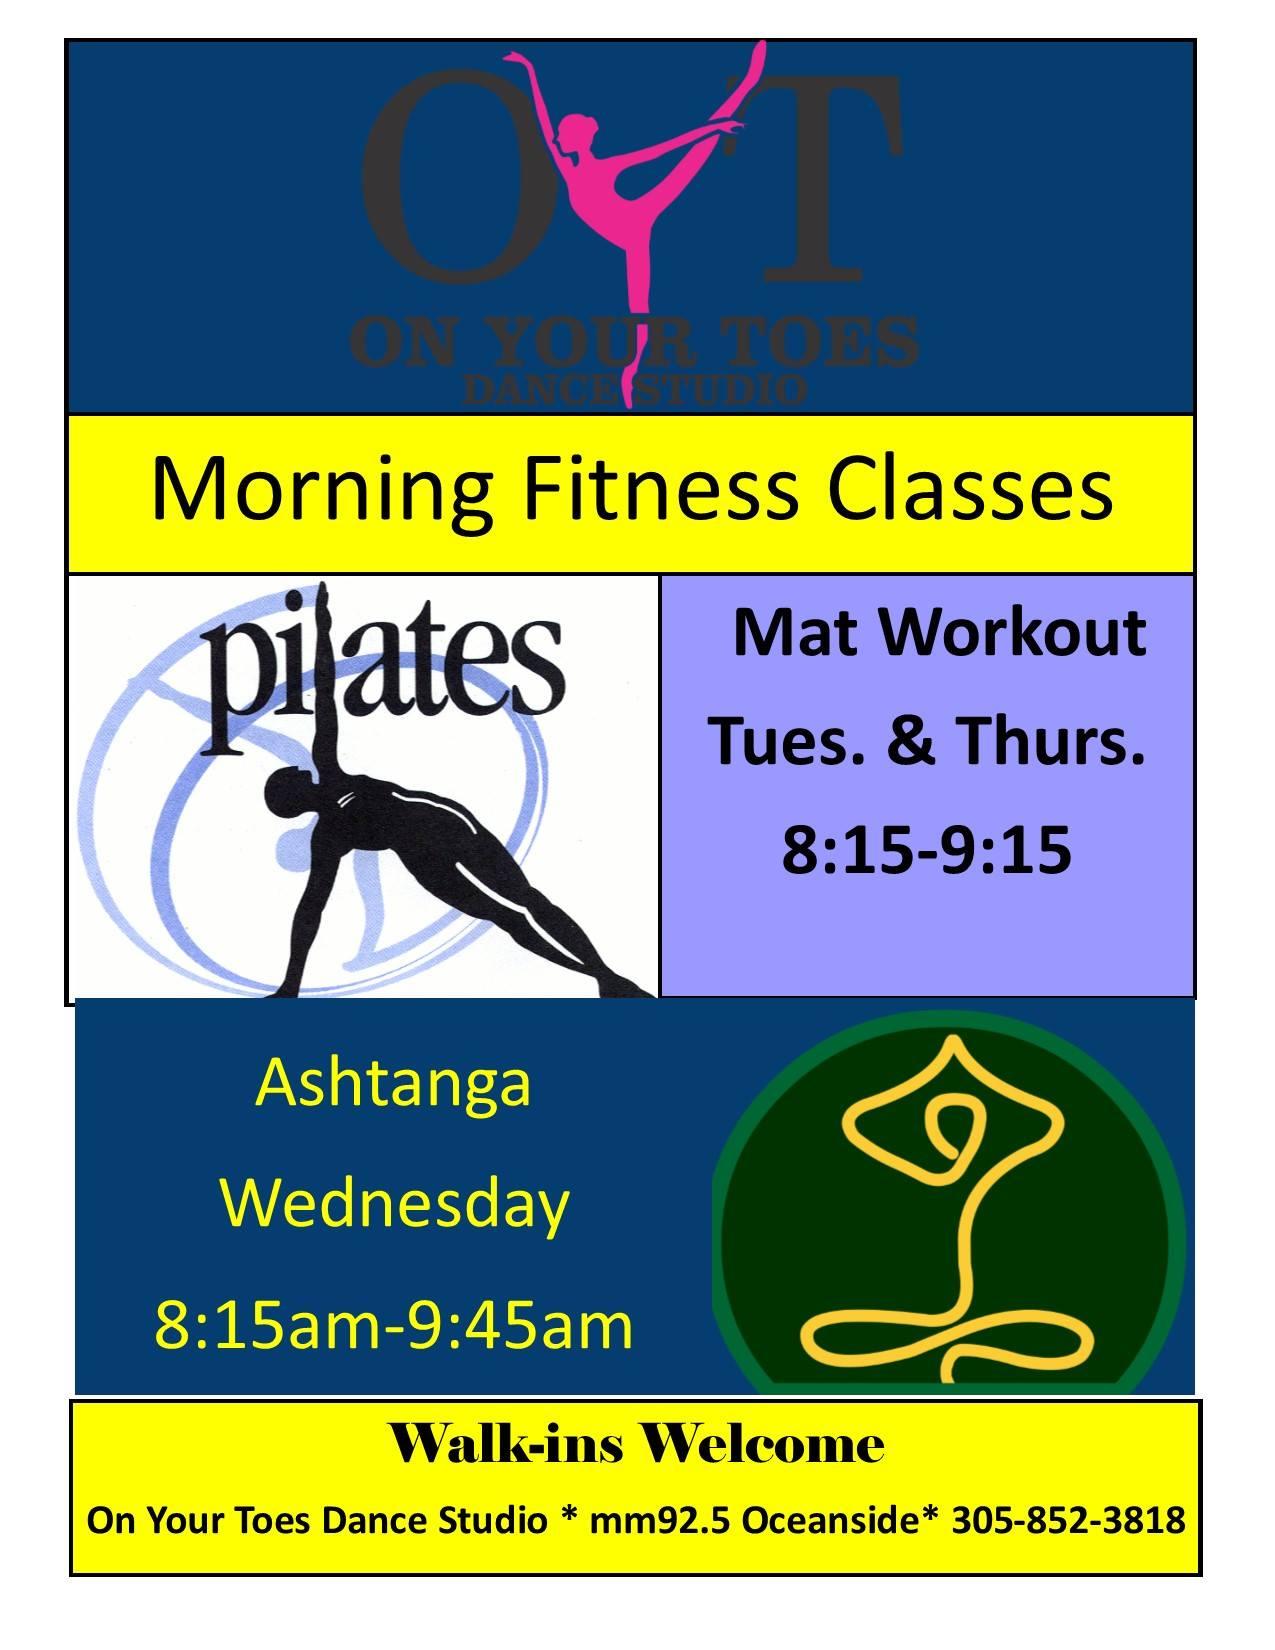 Morning Fitness.jpg